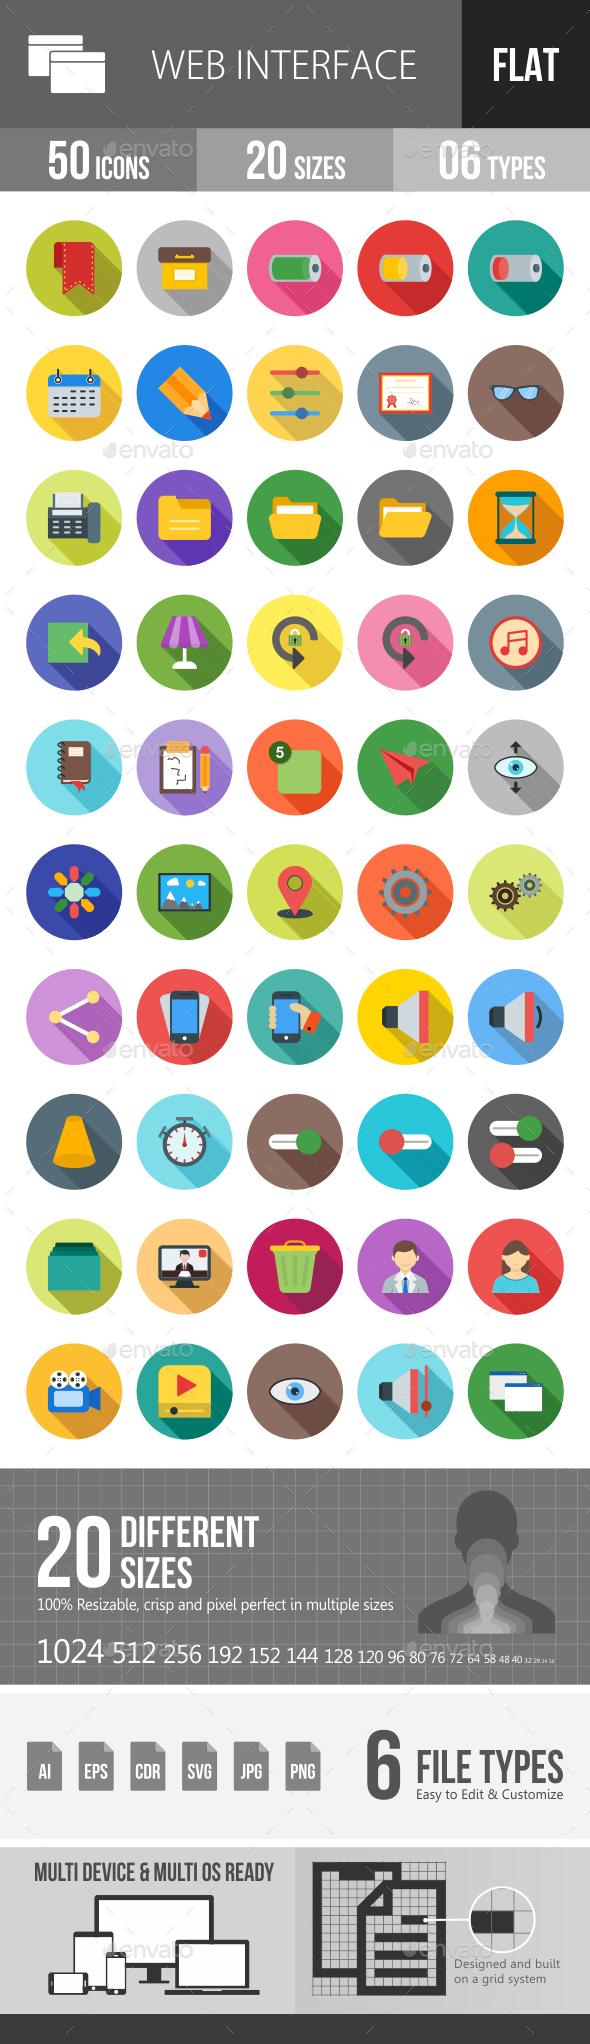 Web Interface Flat Shadowed Icons - Icons